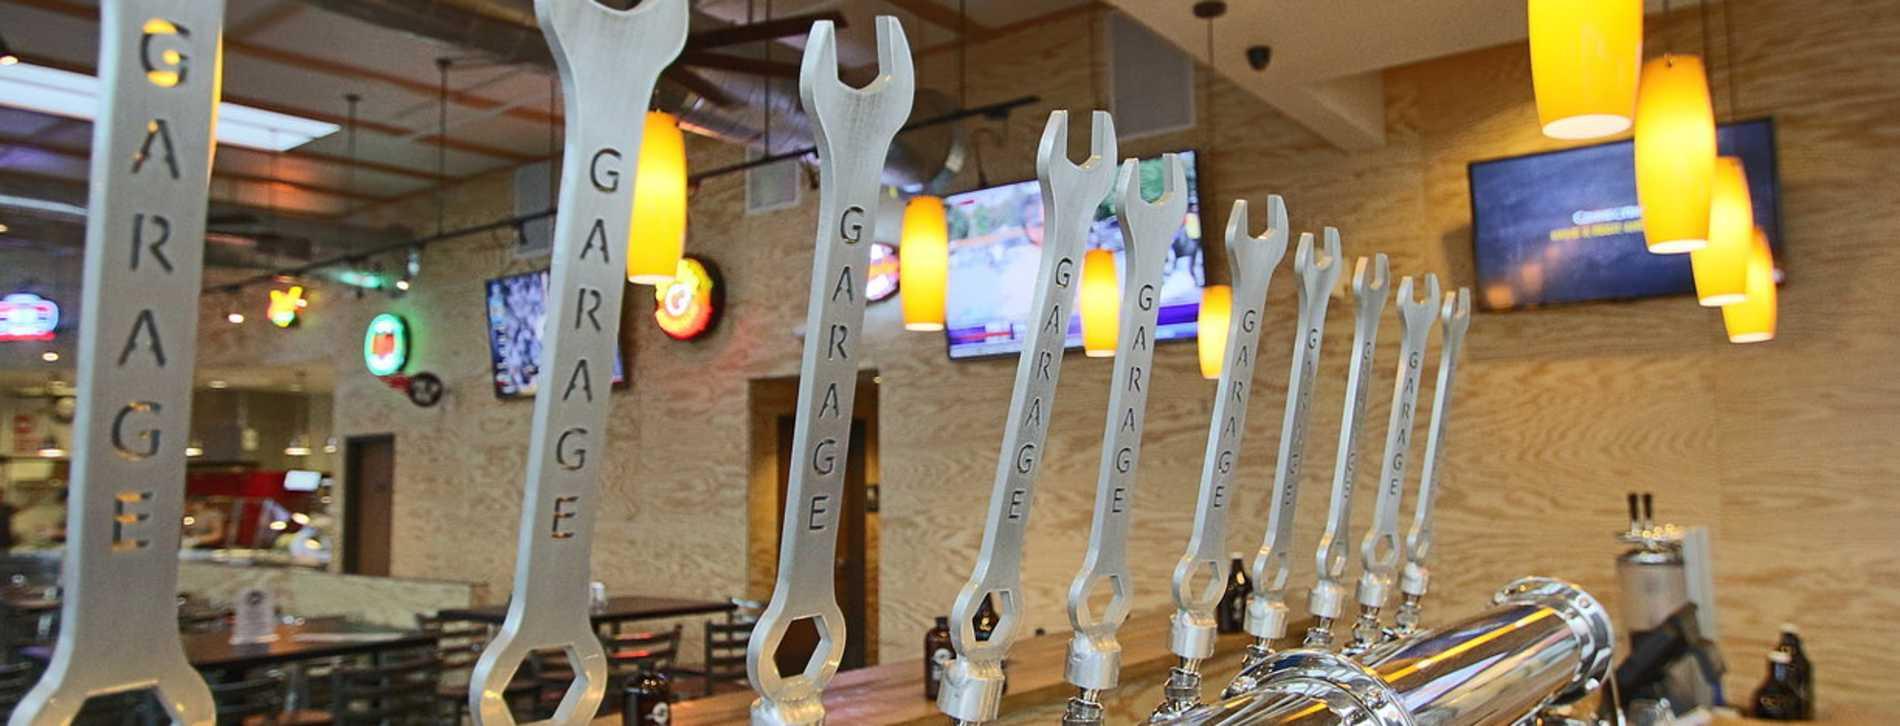 Garage Brewing Company - Temecula